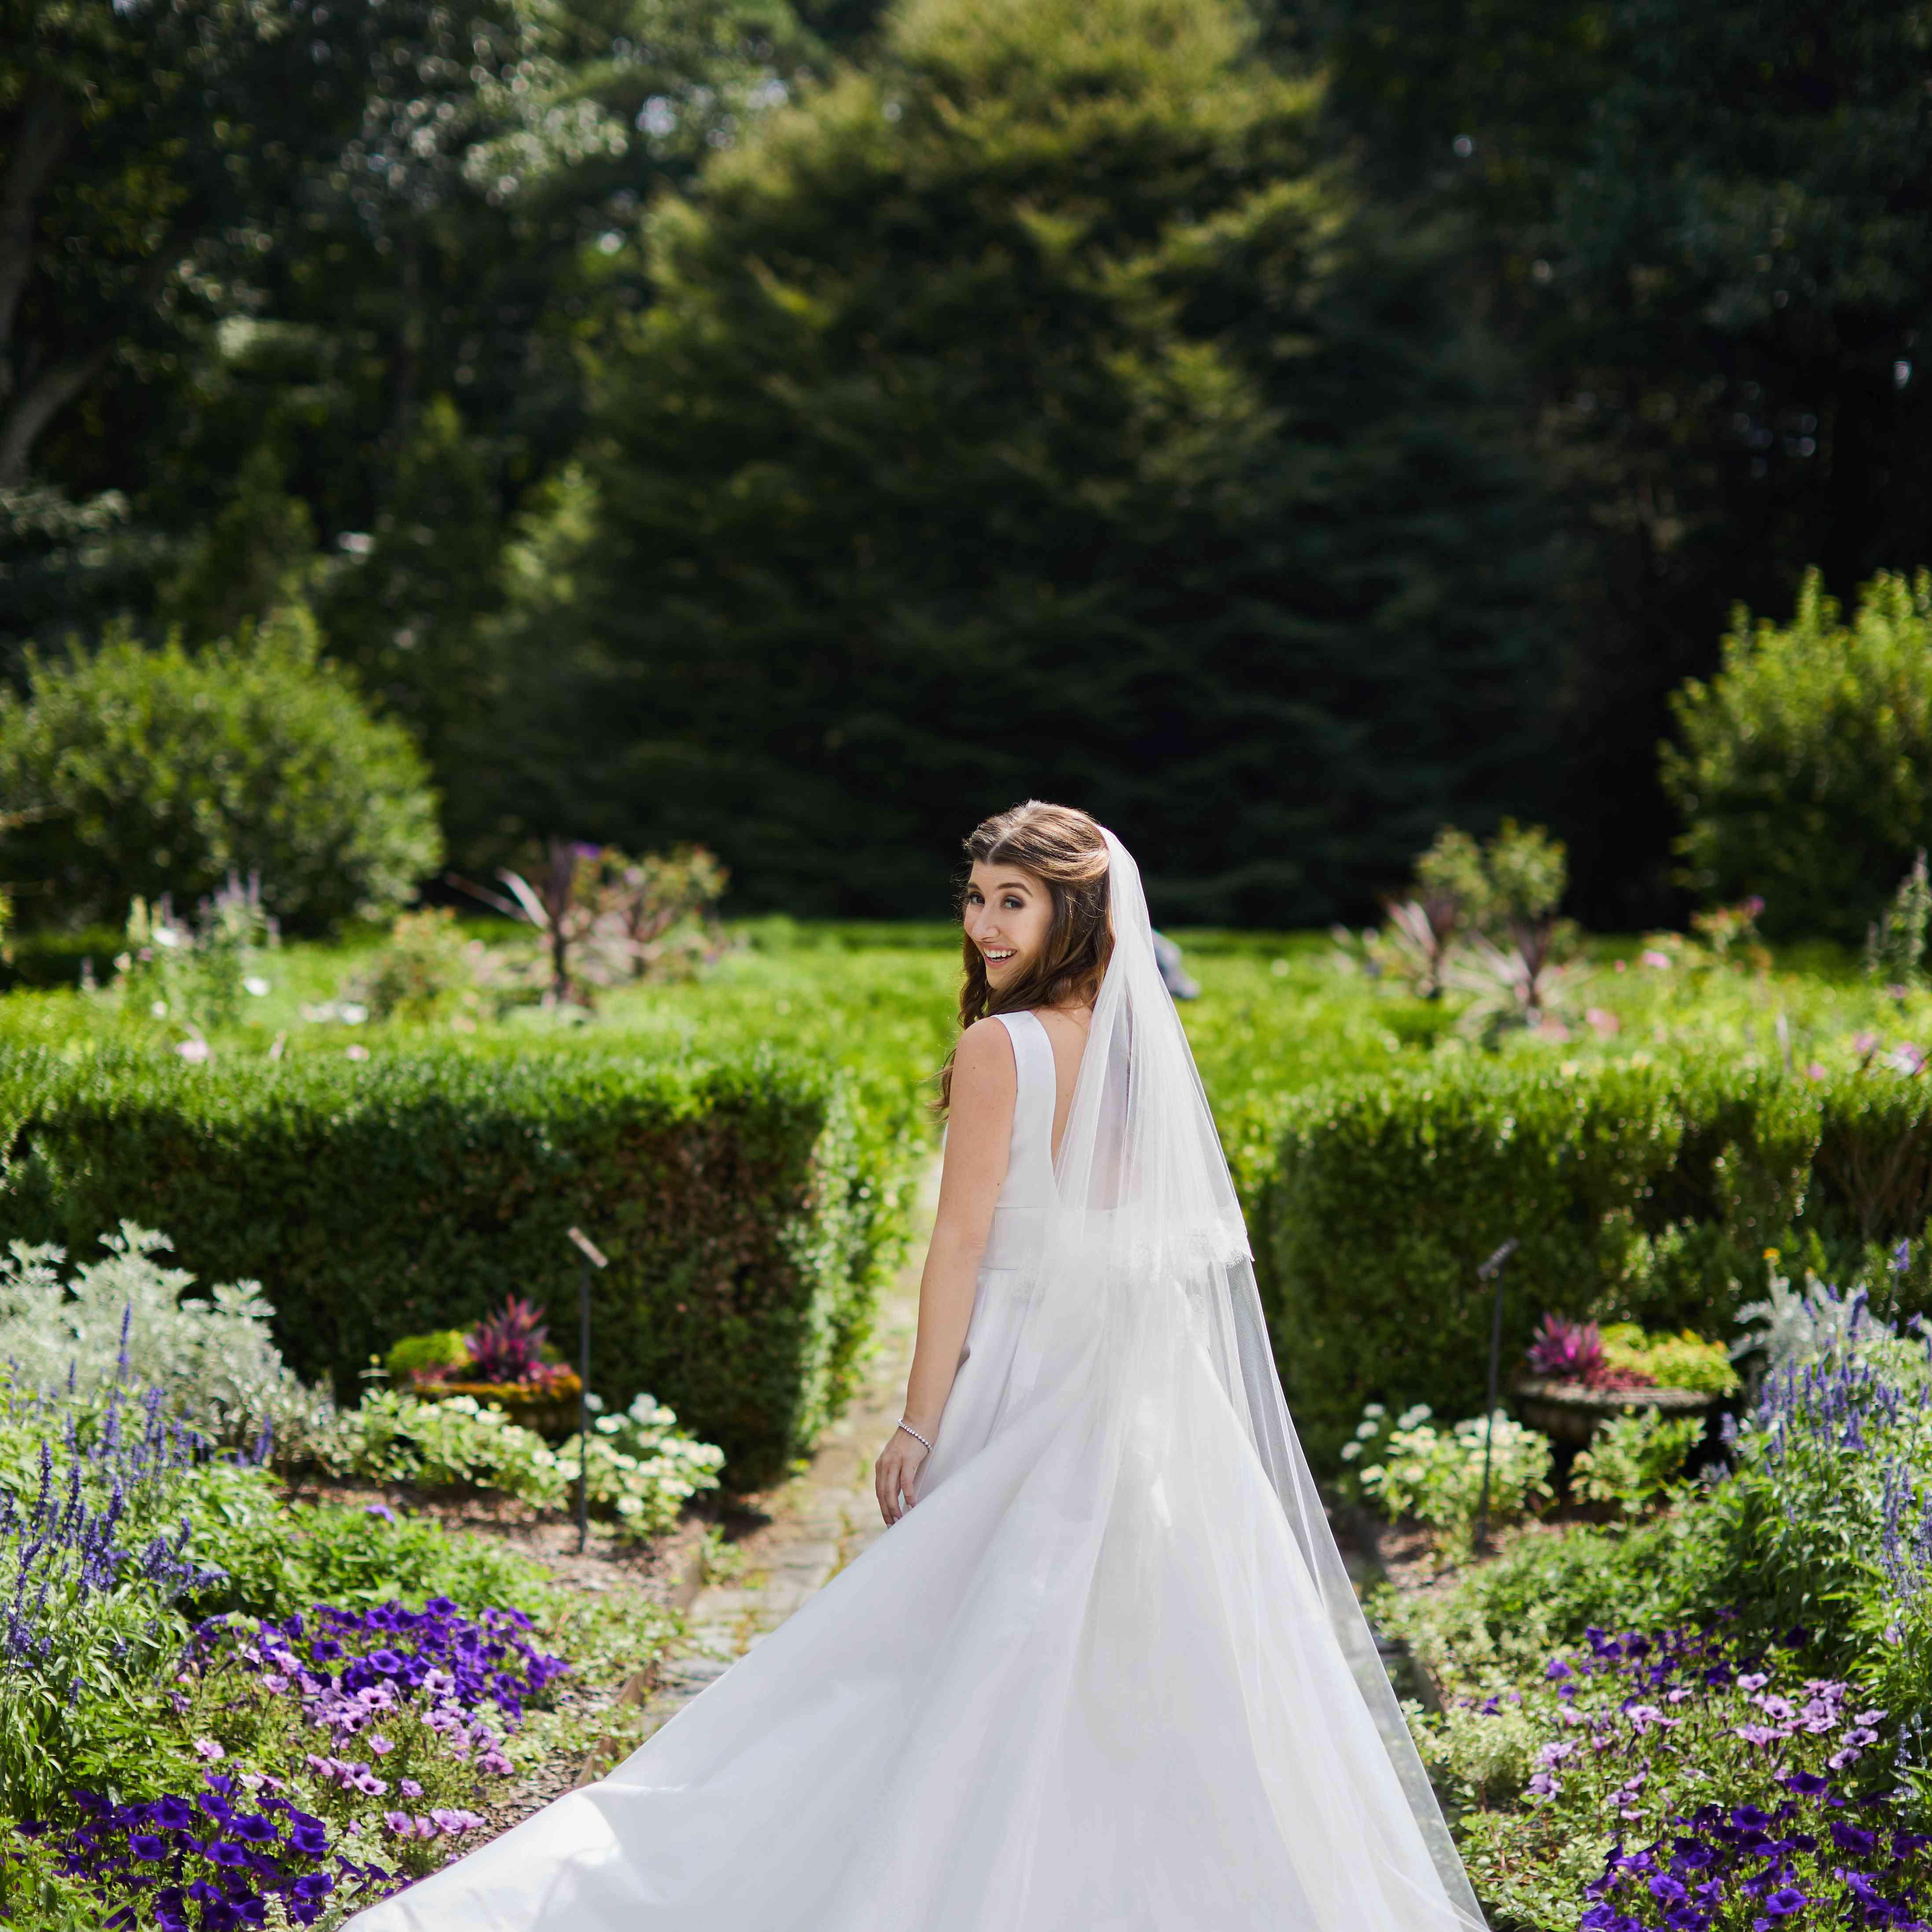 bride in Monique Lhuillier